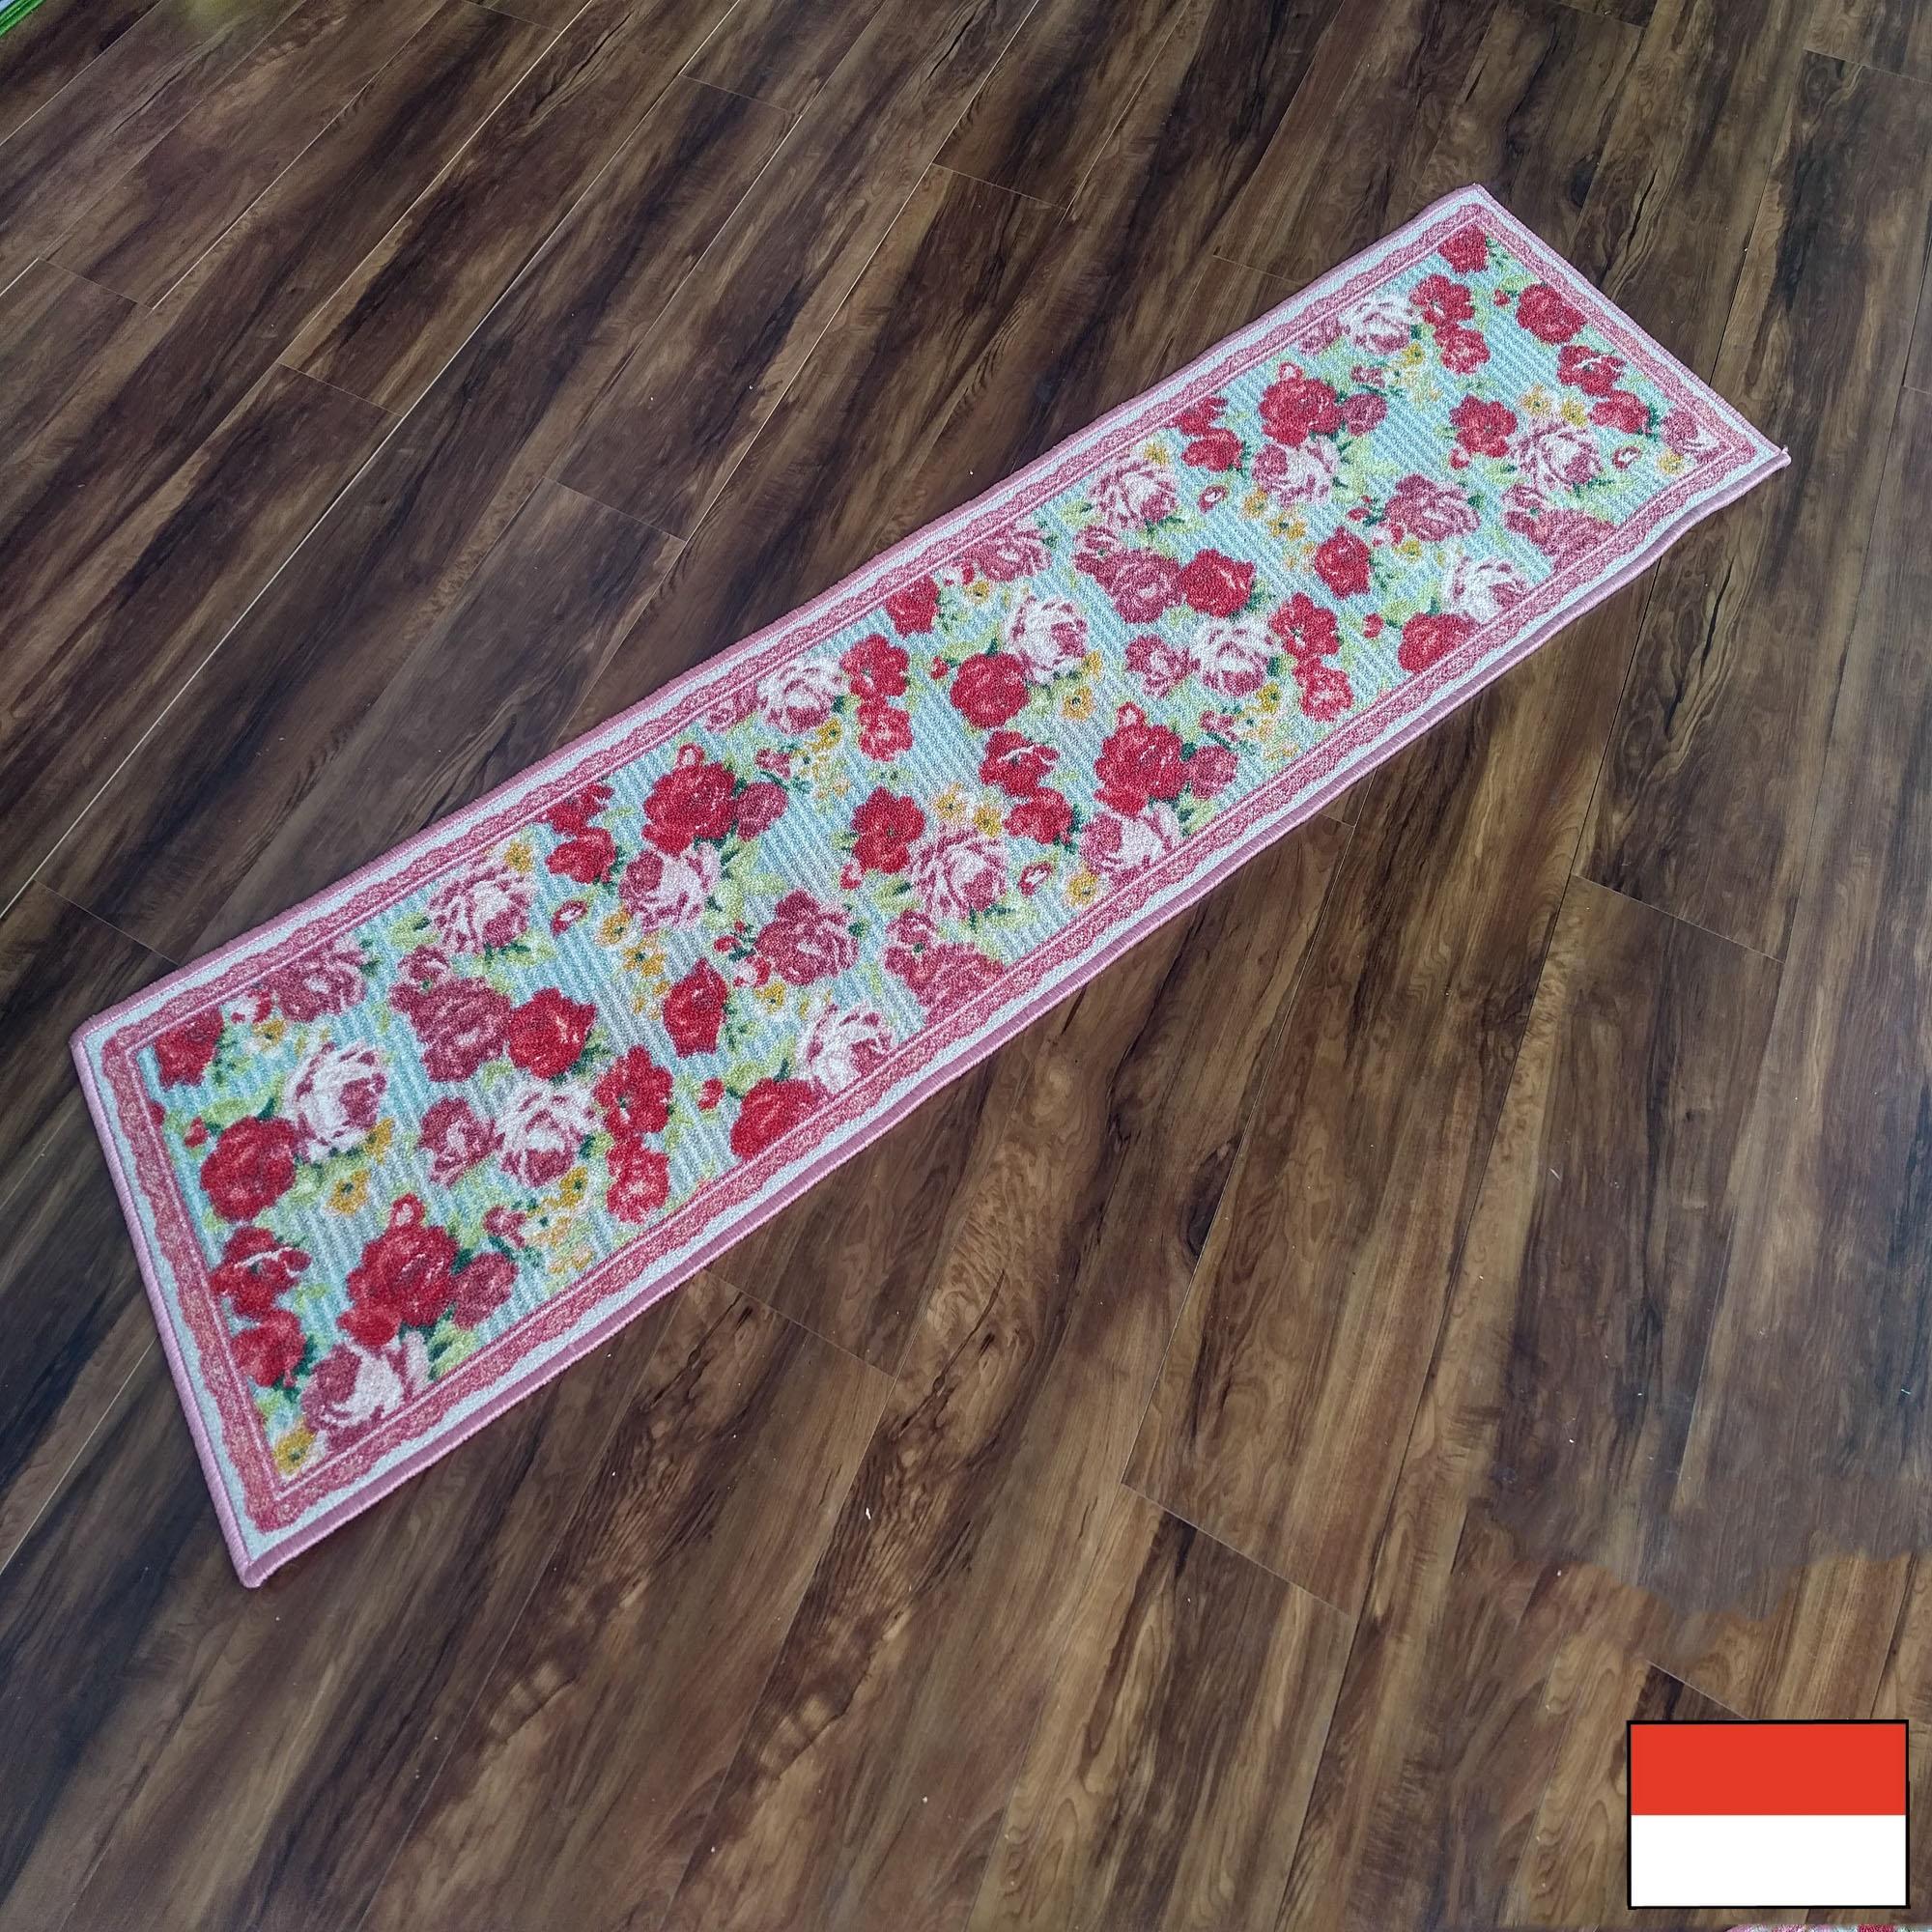 Best Keset Halus Cantik Pintu Keset Dapur Keset Kamar Tidur Kamar Source Fashion . Source ·